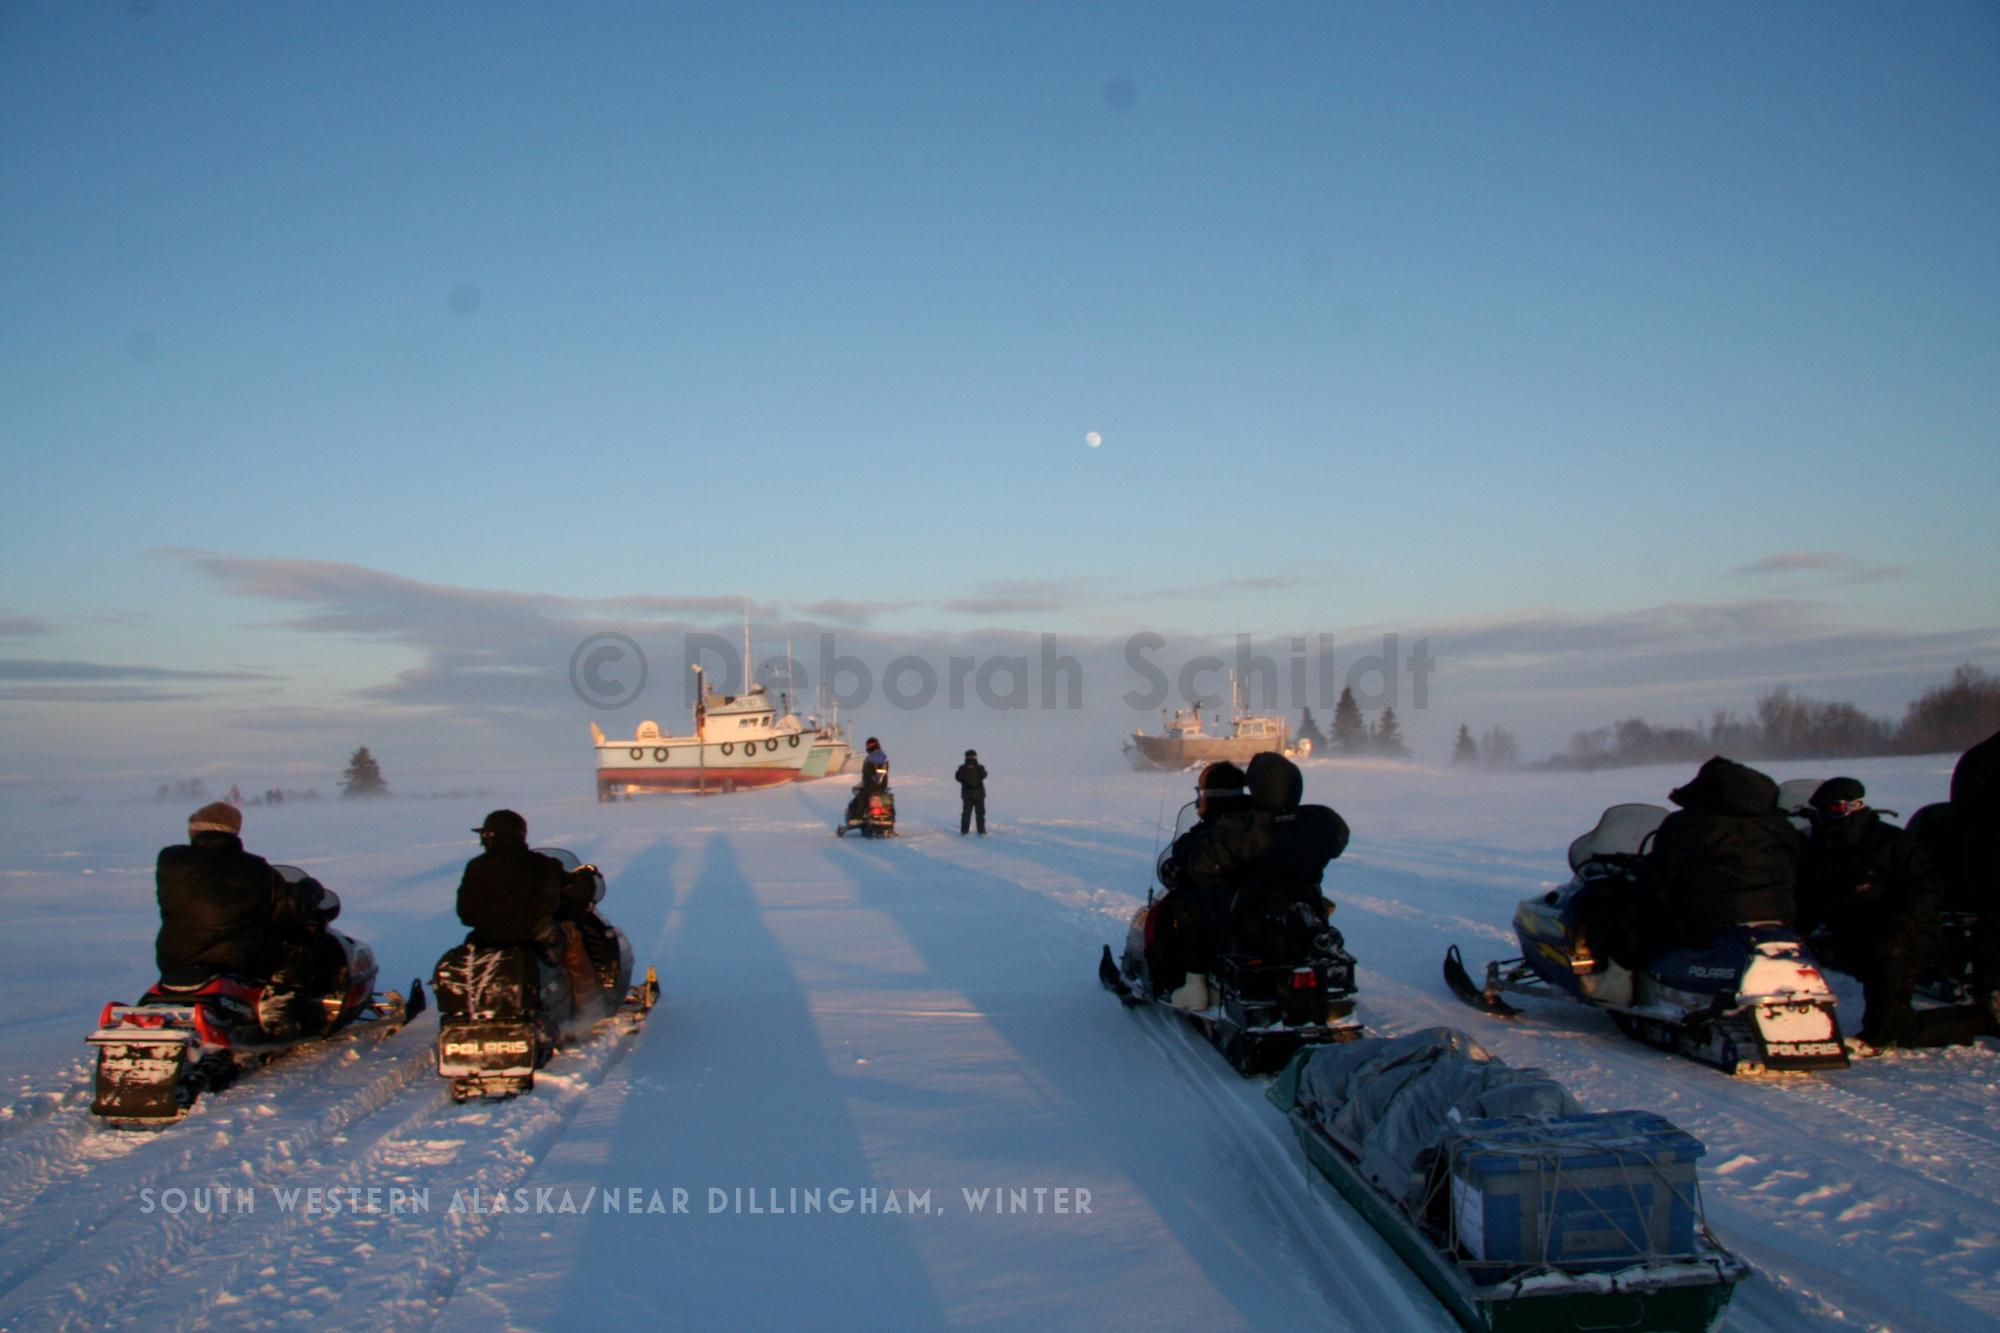 CT13 South Western Alaska-Dillingham_ winter.jpg